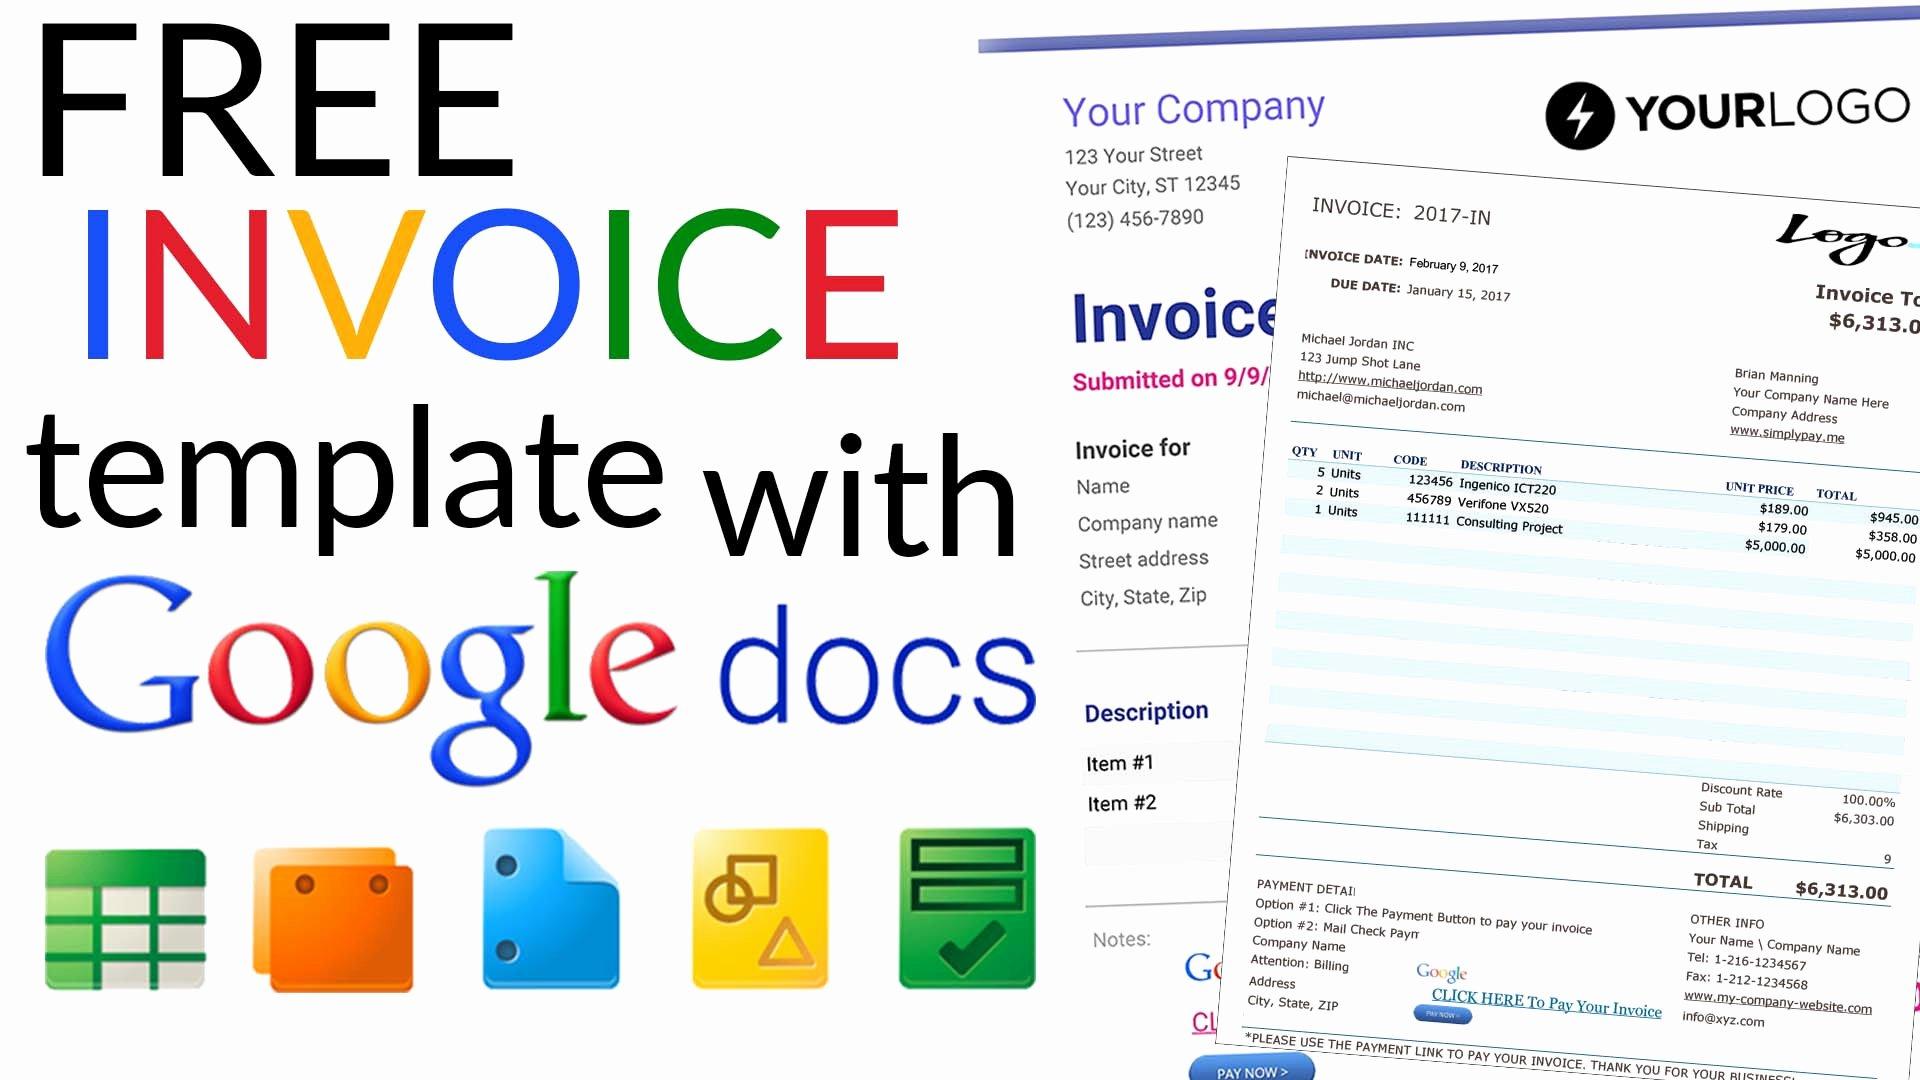 Free Invoice Templates with Google Docs